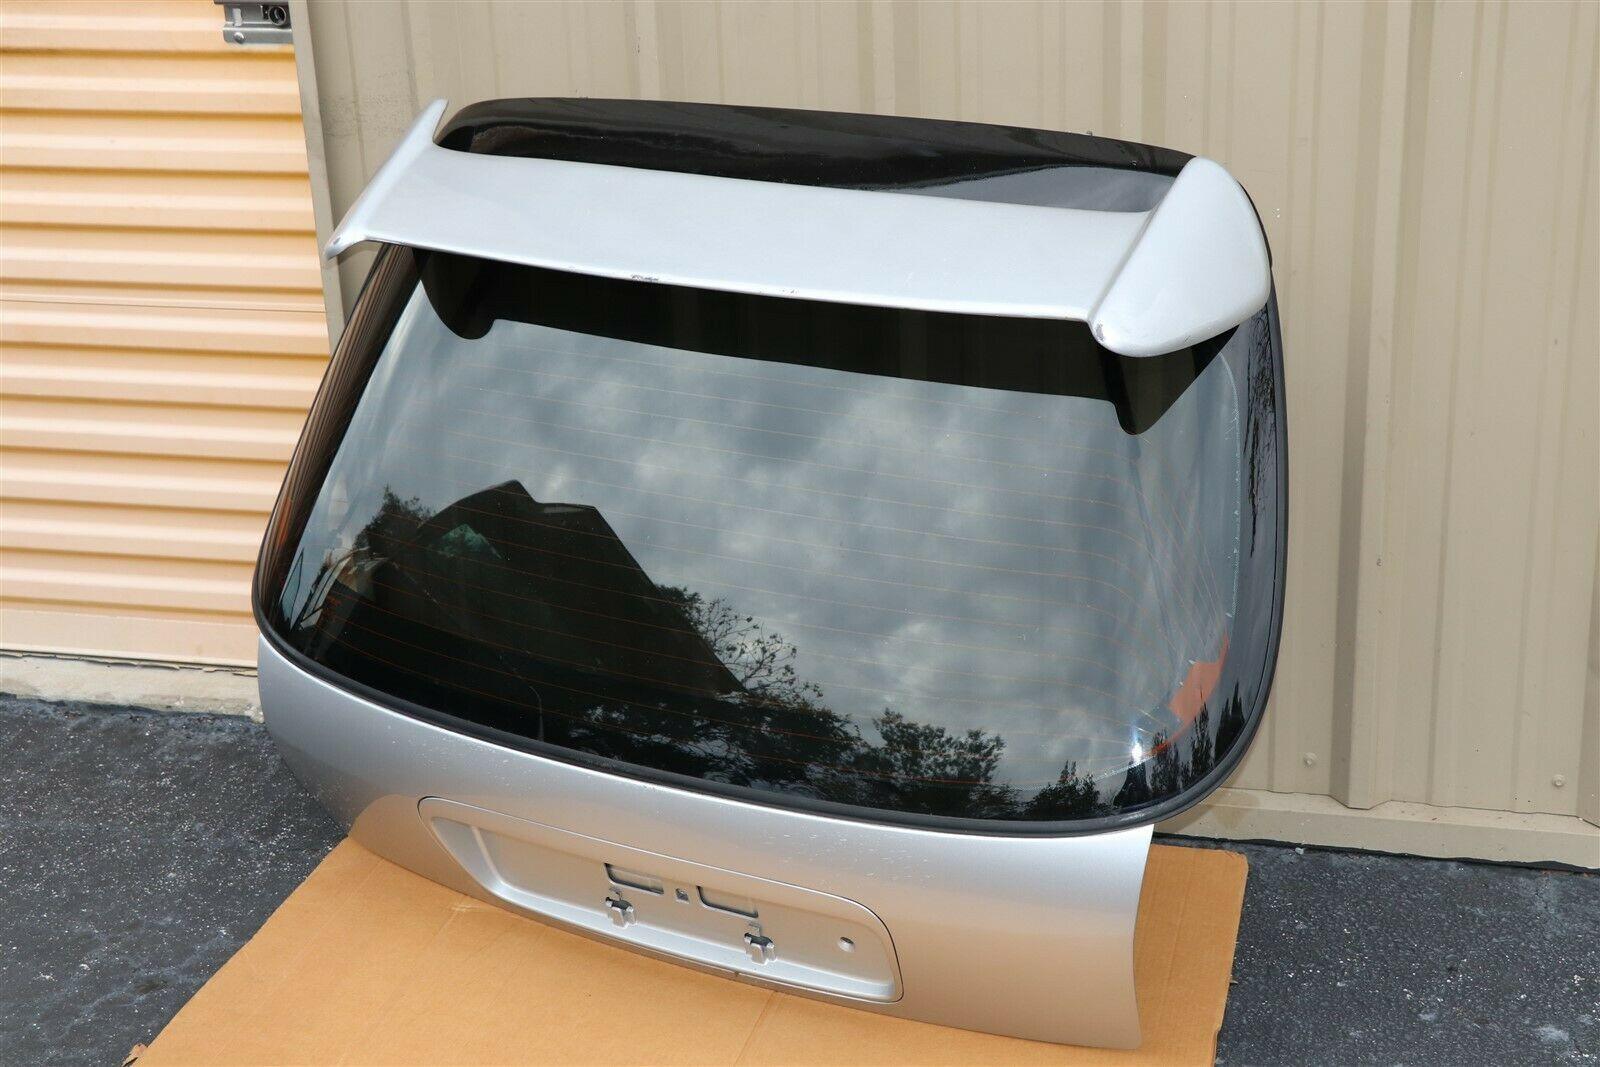 Part: 96-00 Honda Civic EK3 Rear Hatch Tailgate Liftgate Trunk Lid W/Spoiler